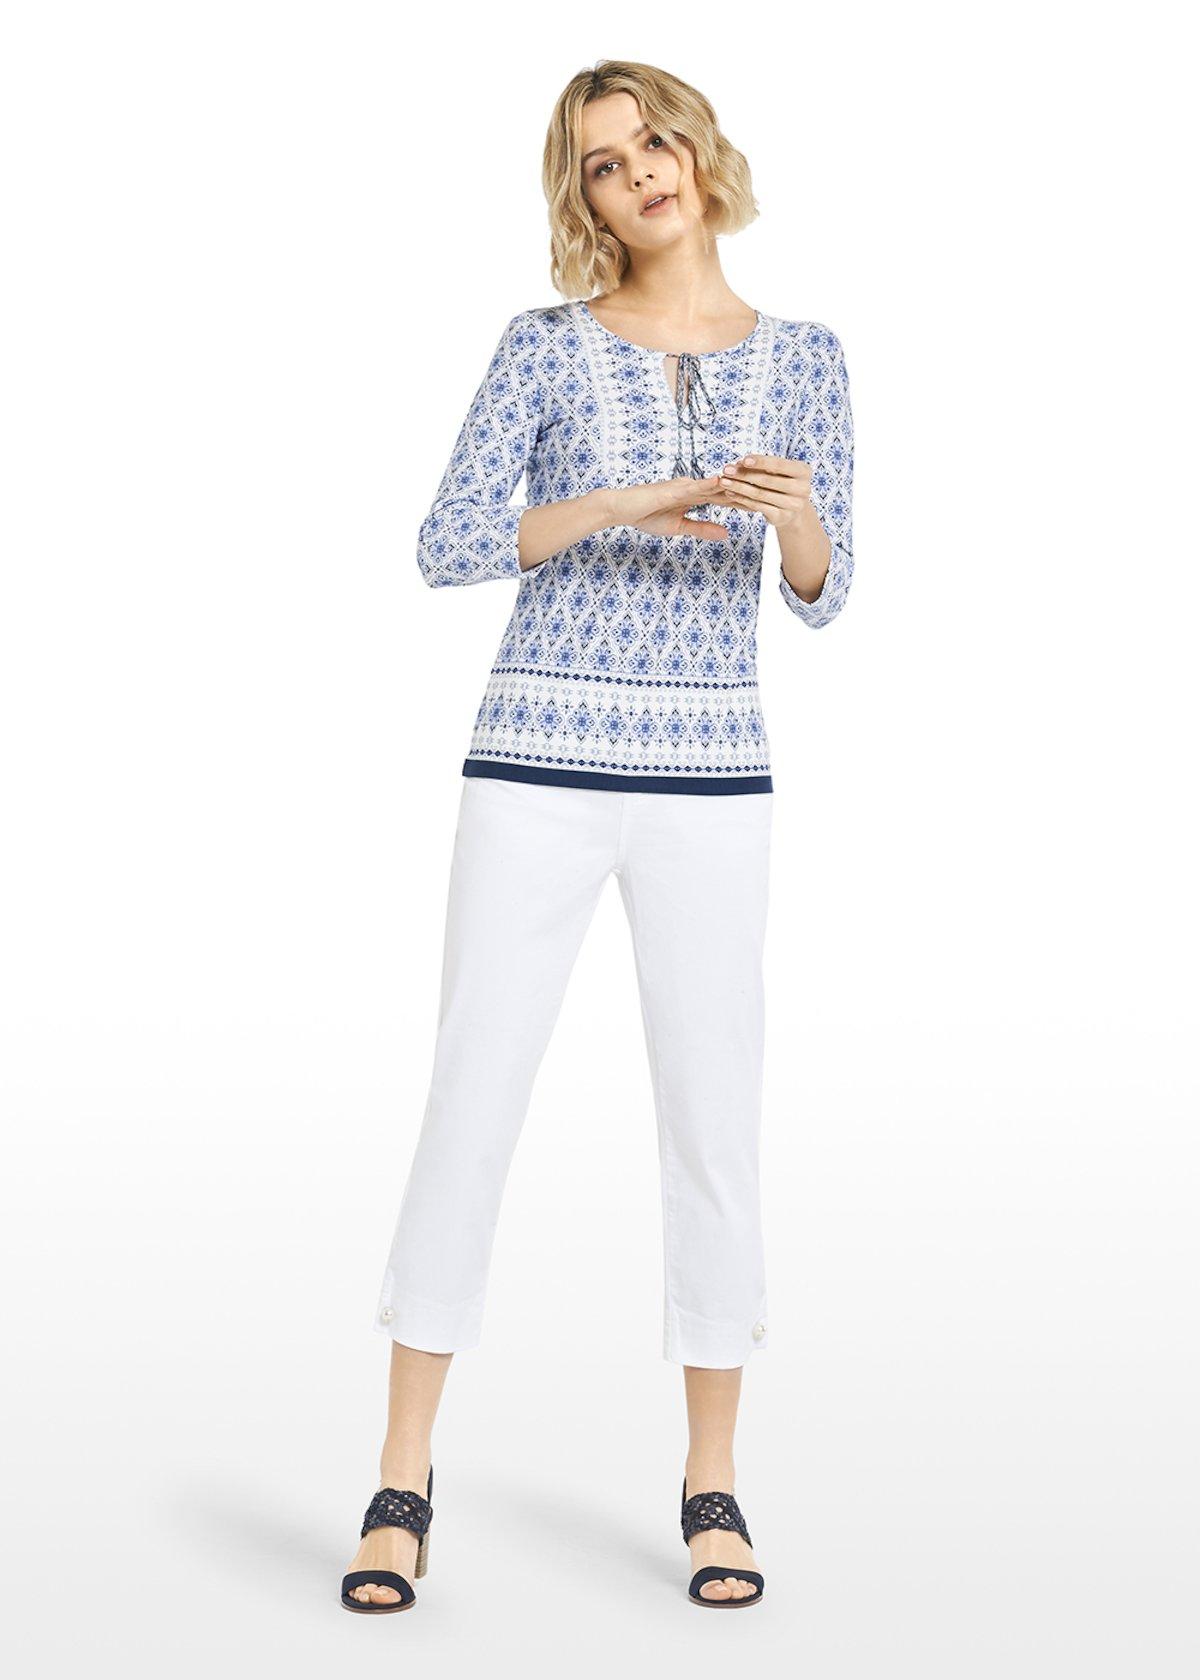 All over azulejo pattern jersey Saril t-shirt - White / Avion  Fantasia - Woman